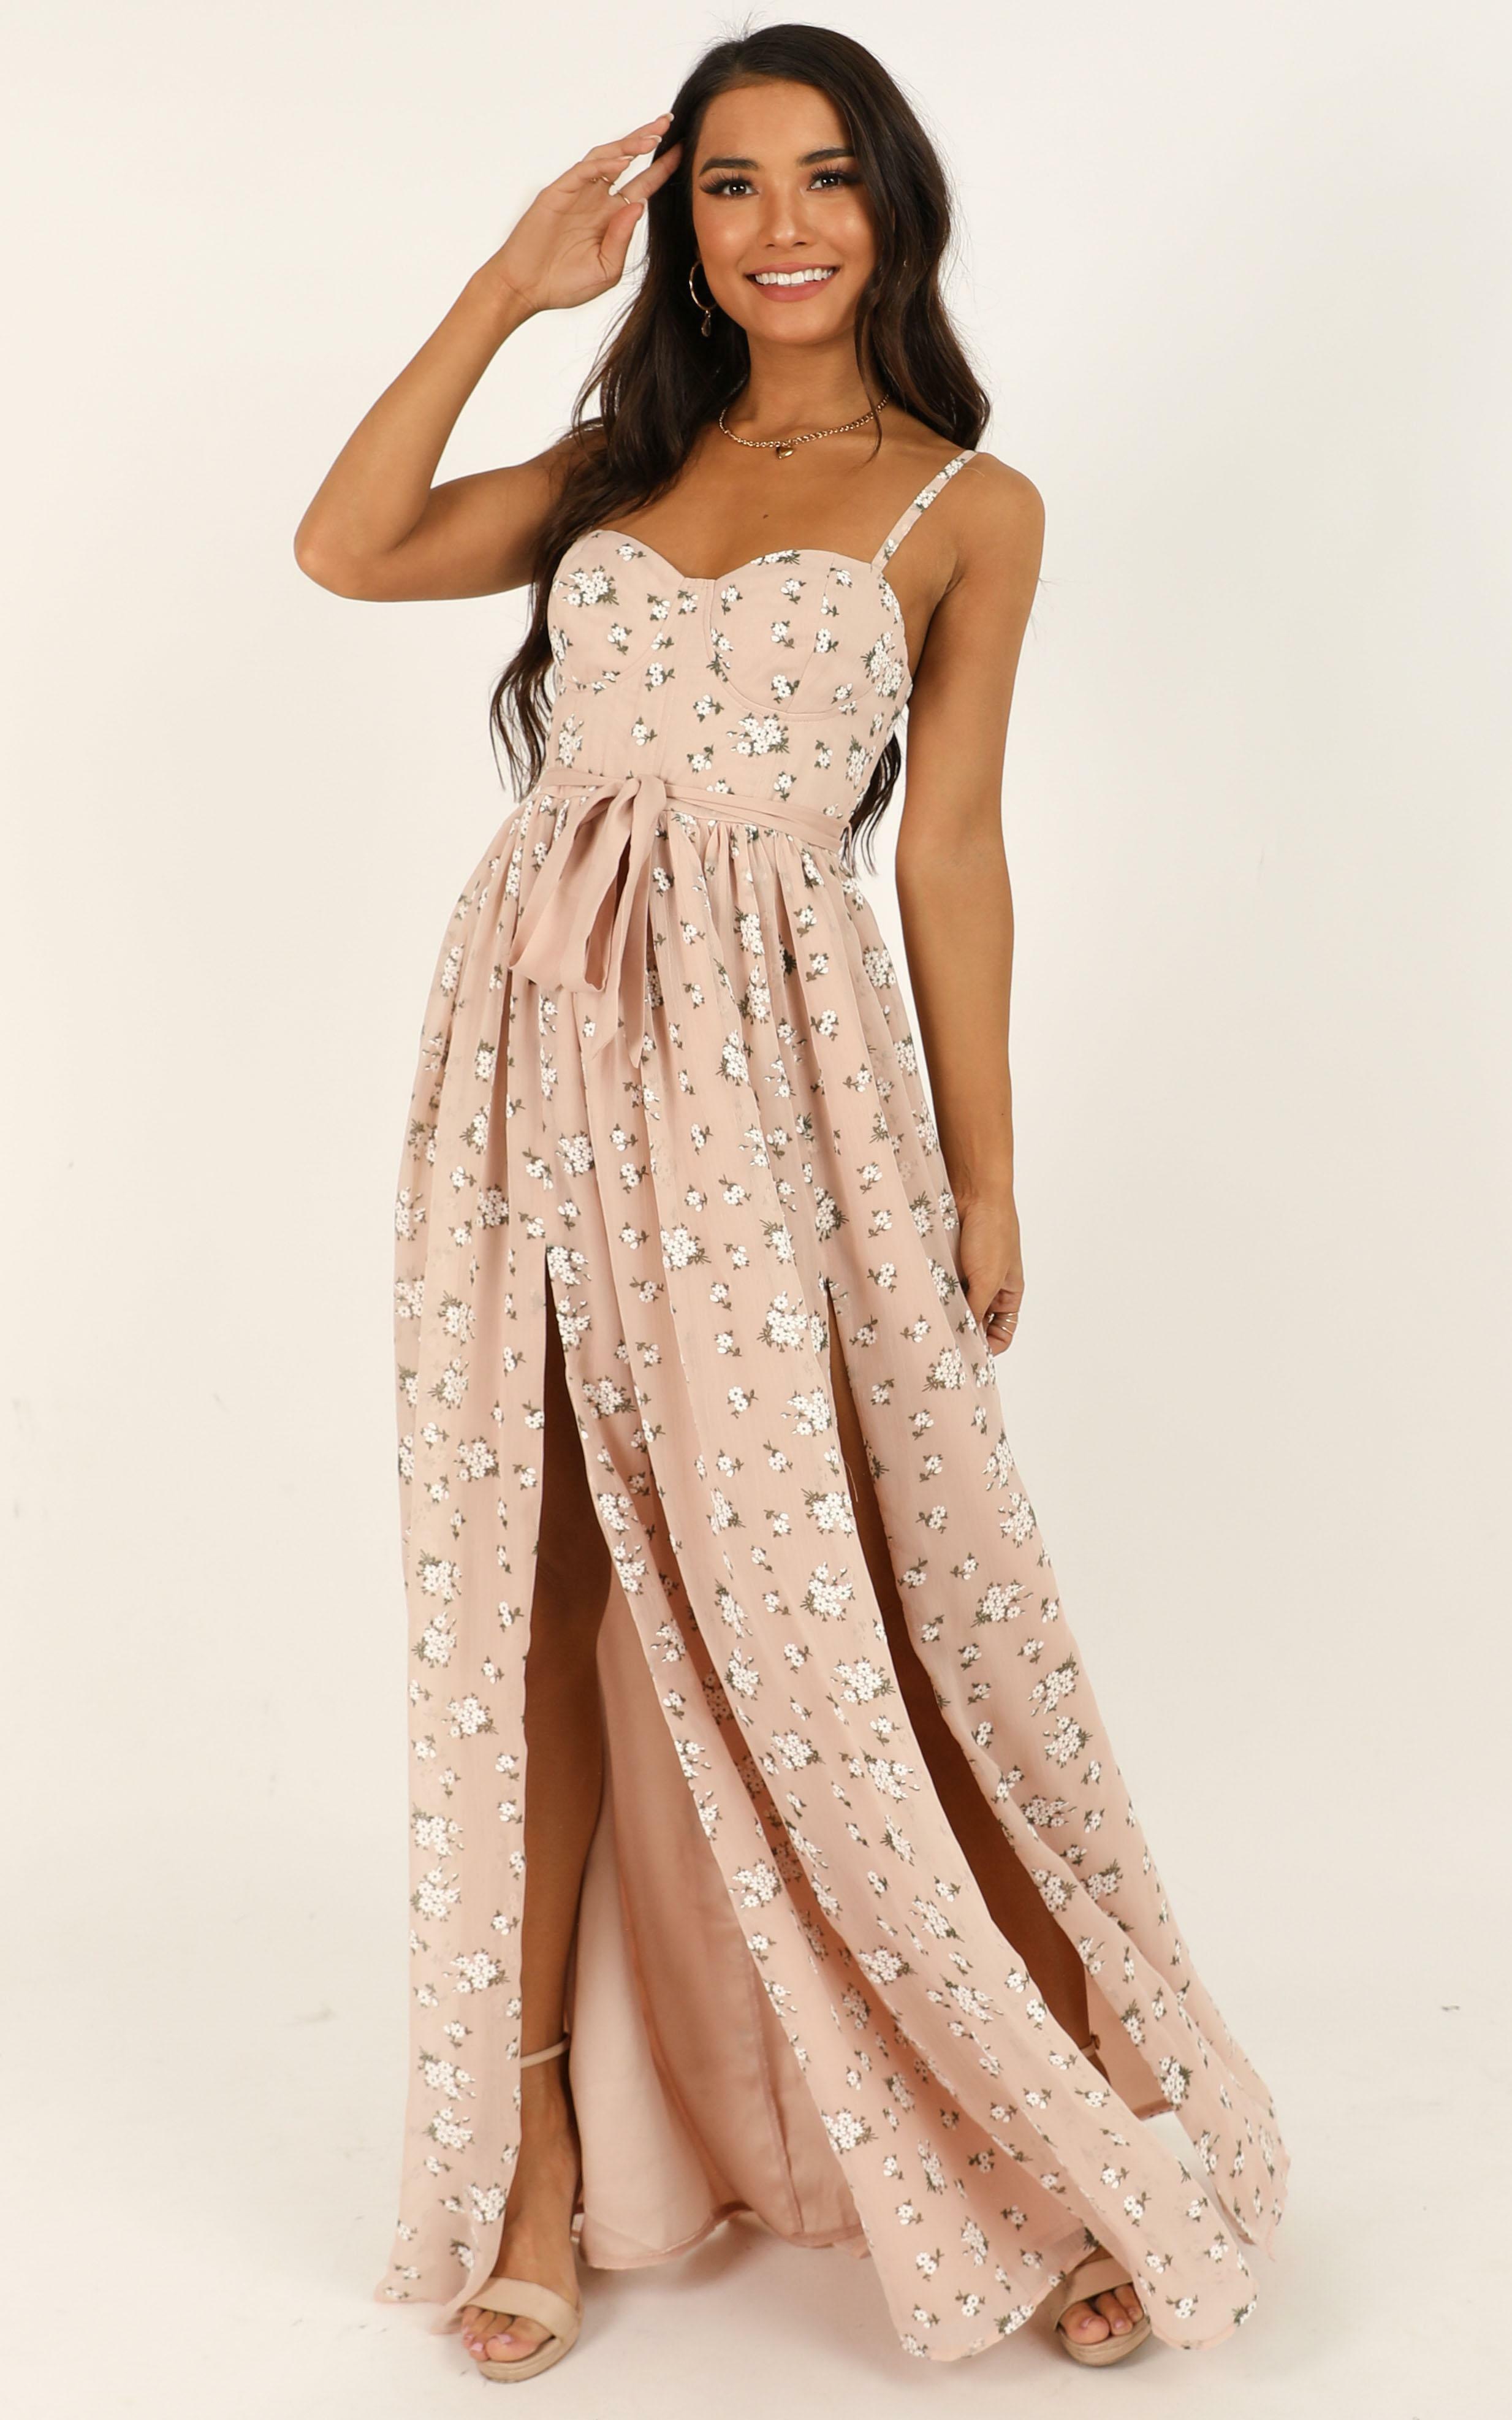 Tear Drops Dress in blush floral - 14 (XL), Blush, hi-res image number null